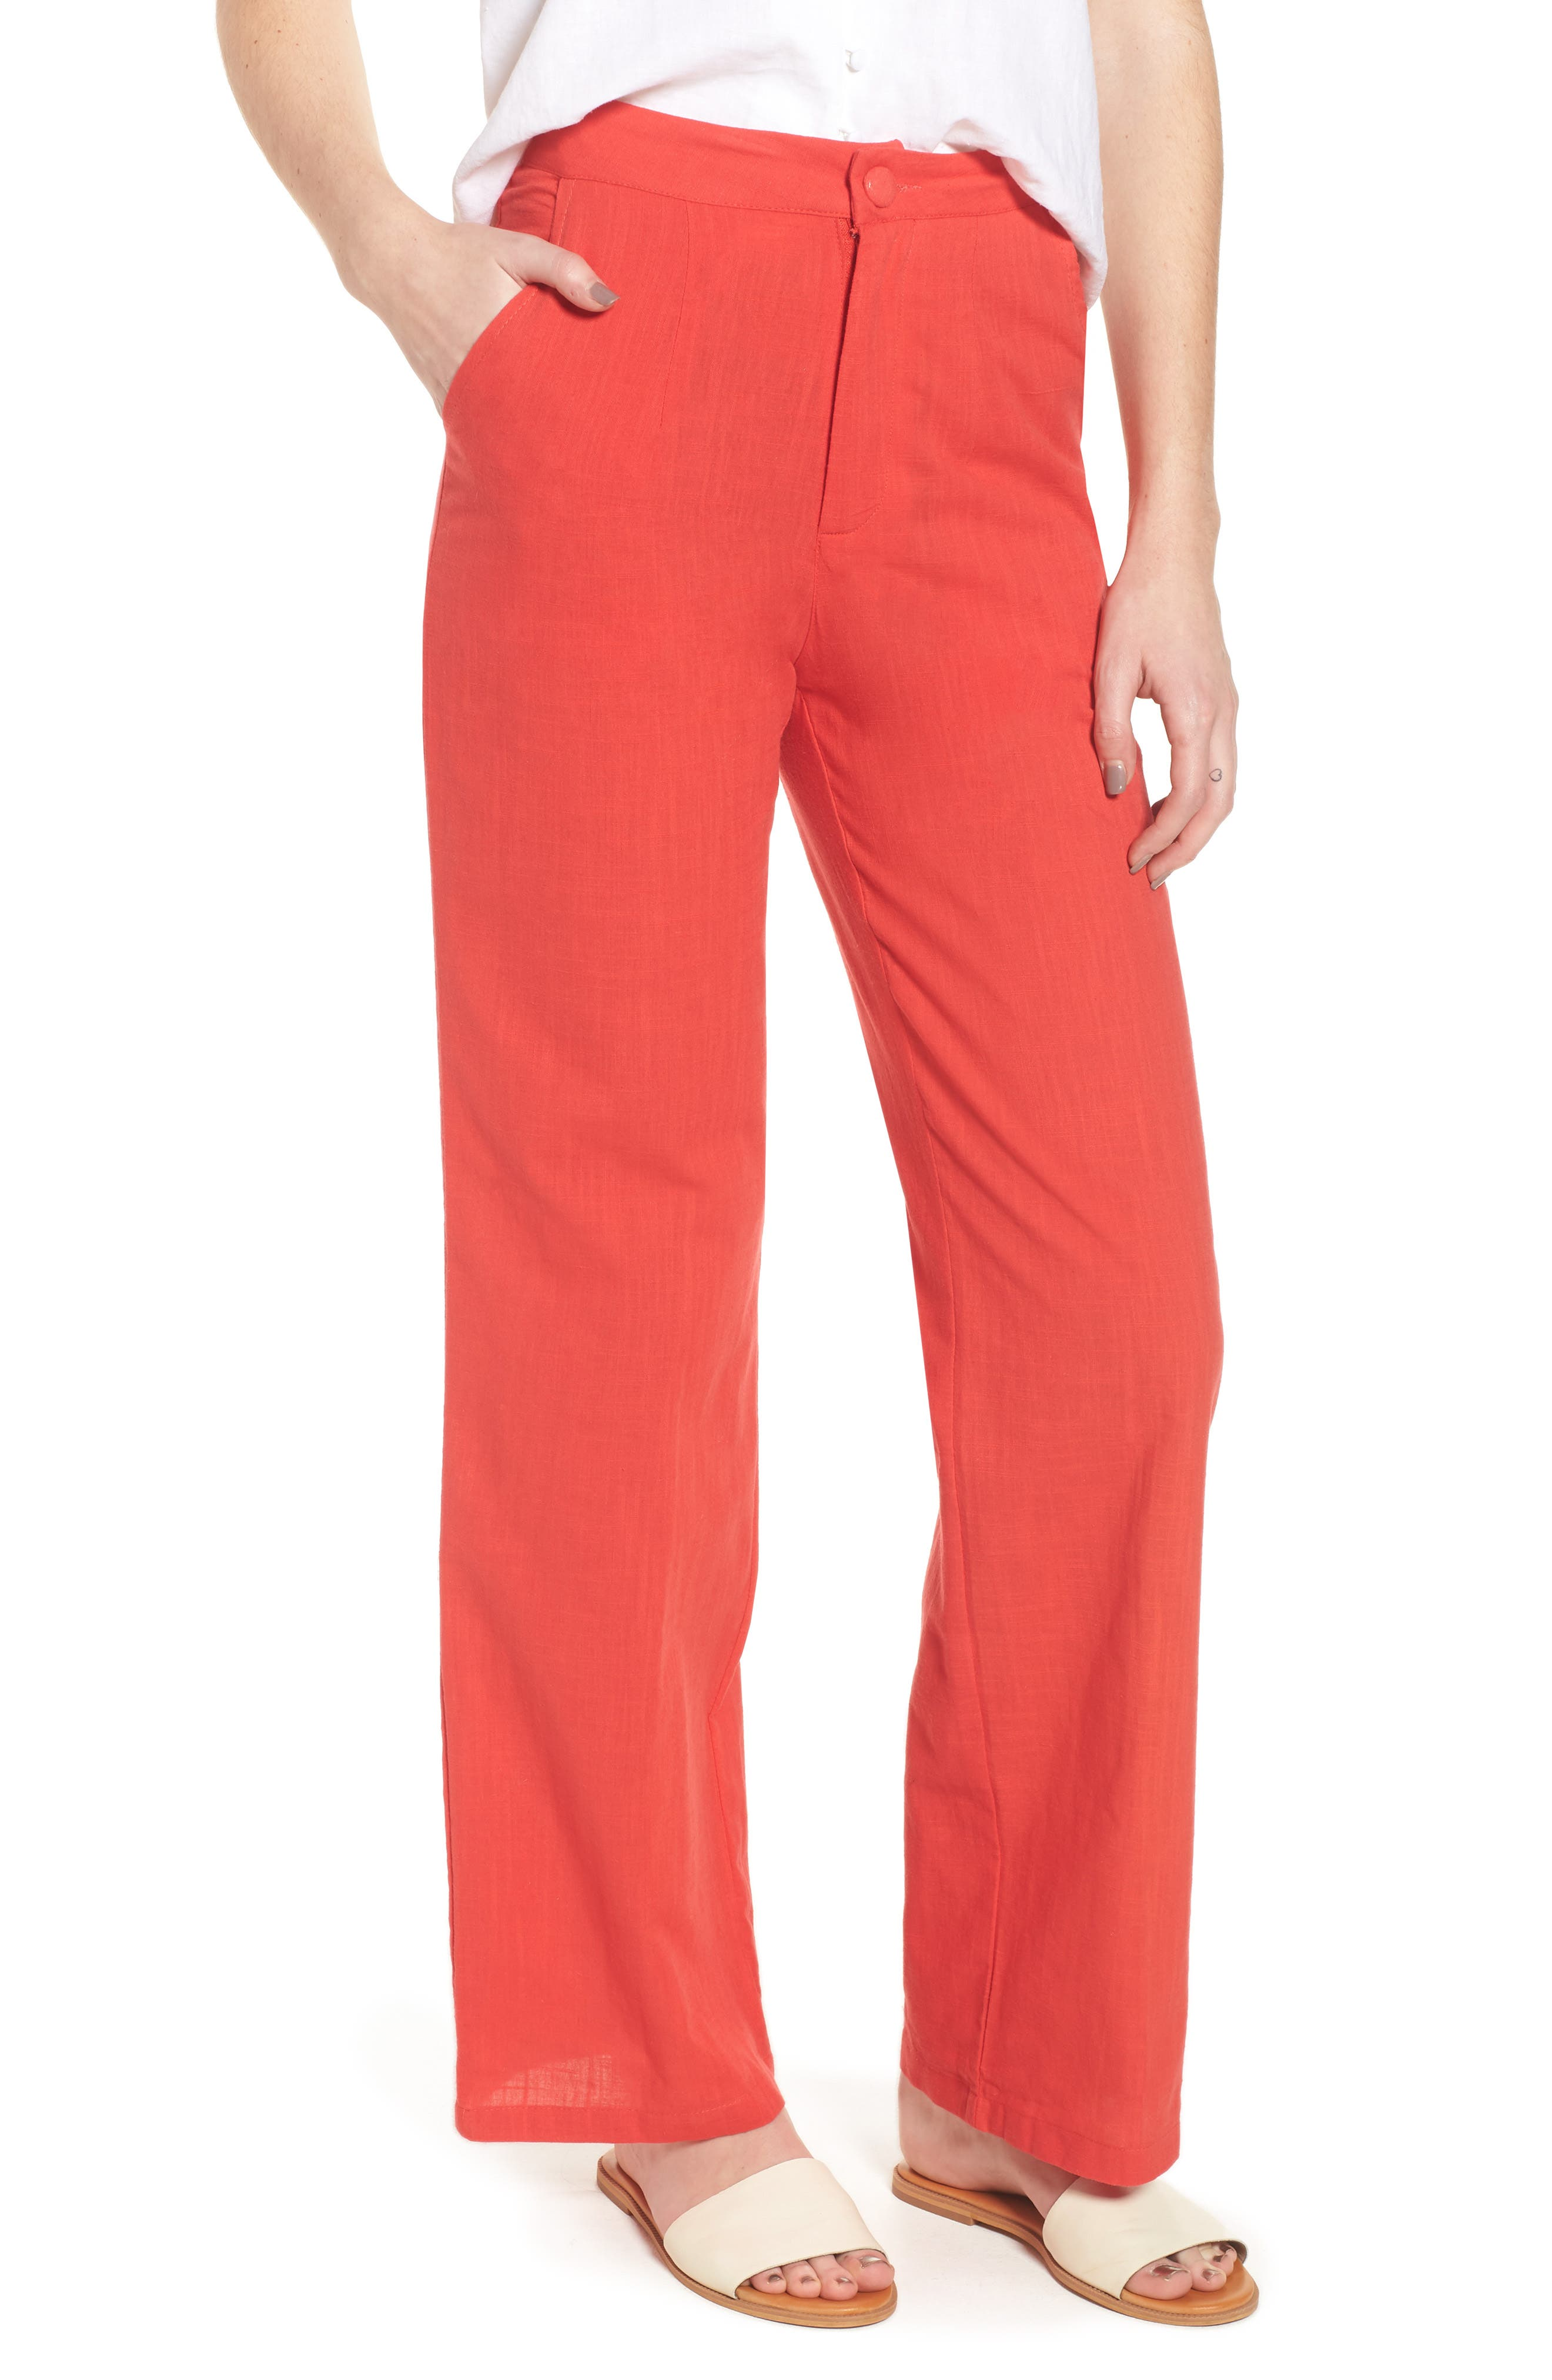 Femme Fatale High Waist Pants,                         Main,                         color, Red